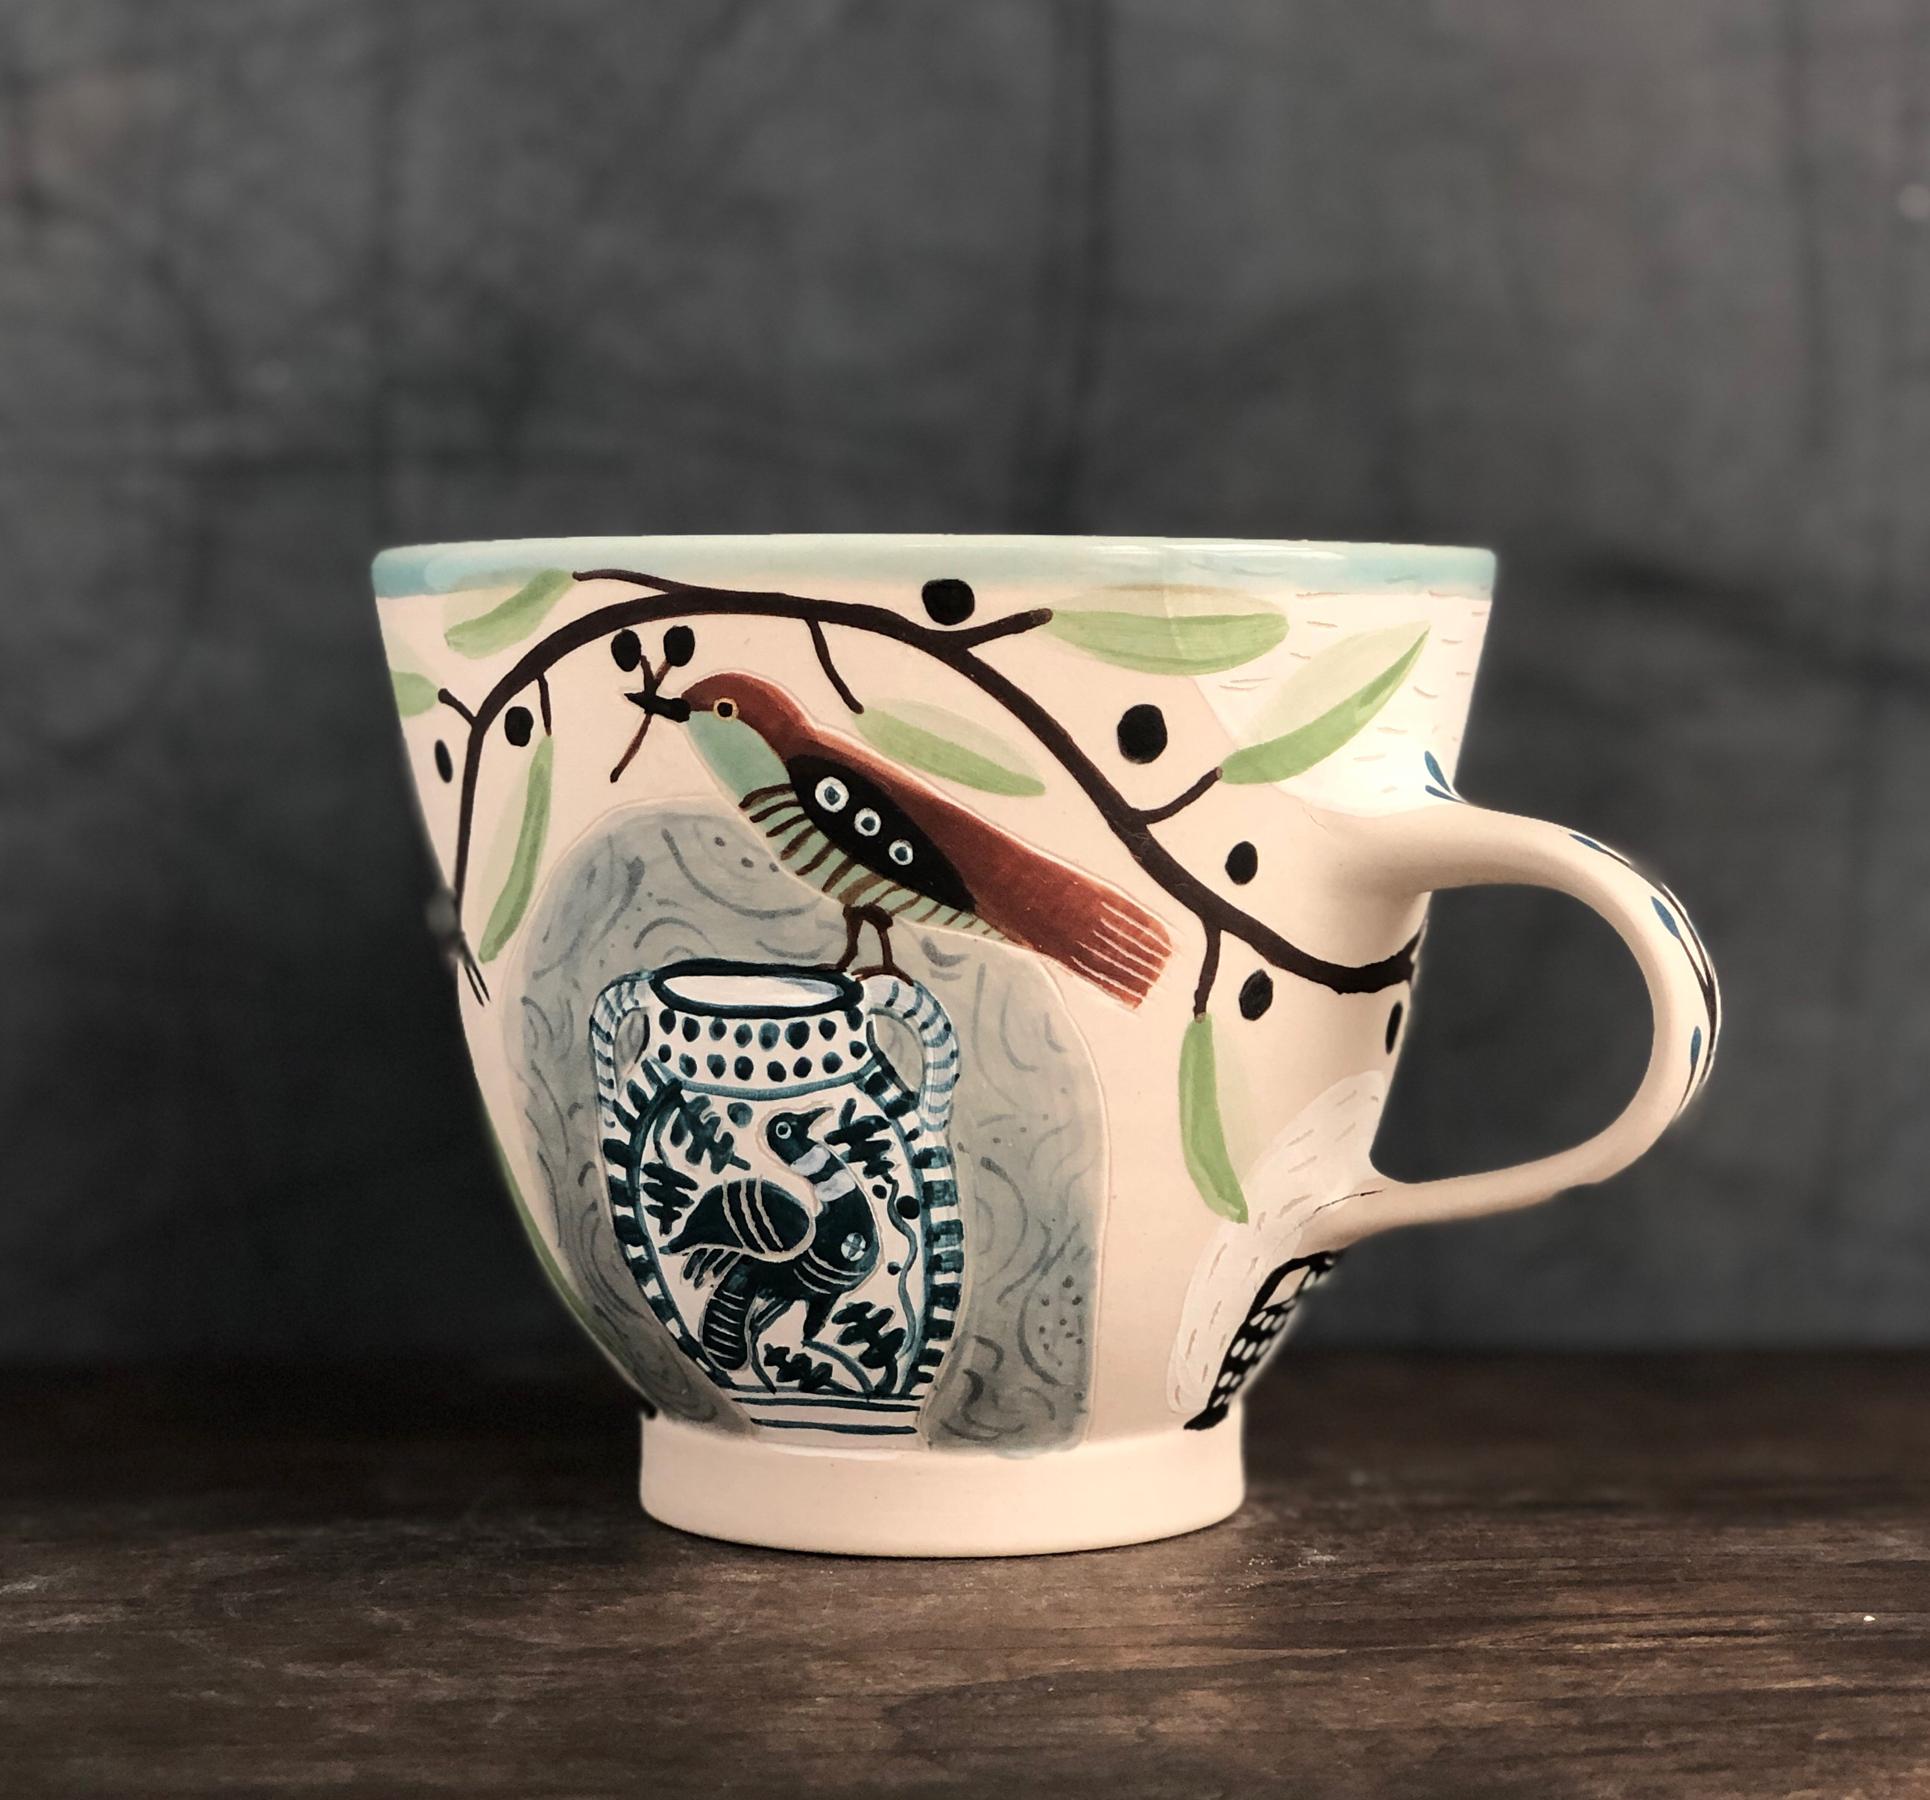 15-Gabrielle_schaffner_porcelain_painted_mug_pottery_and_birds.jpg